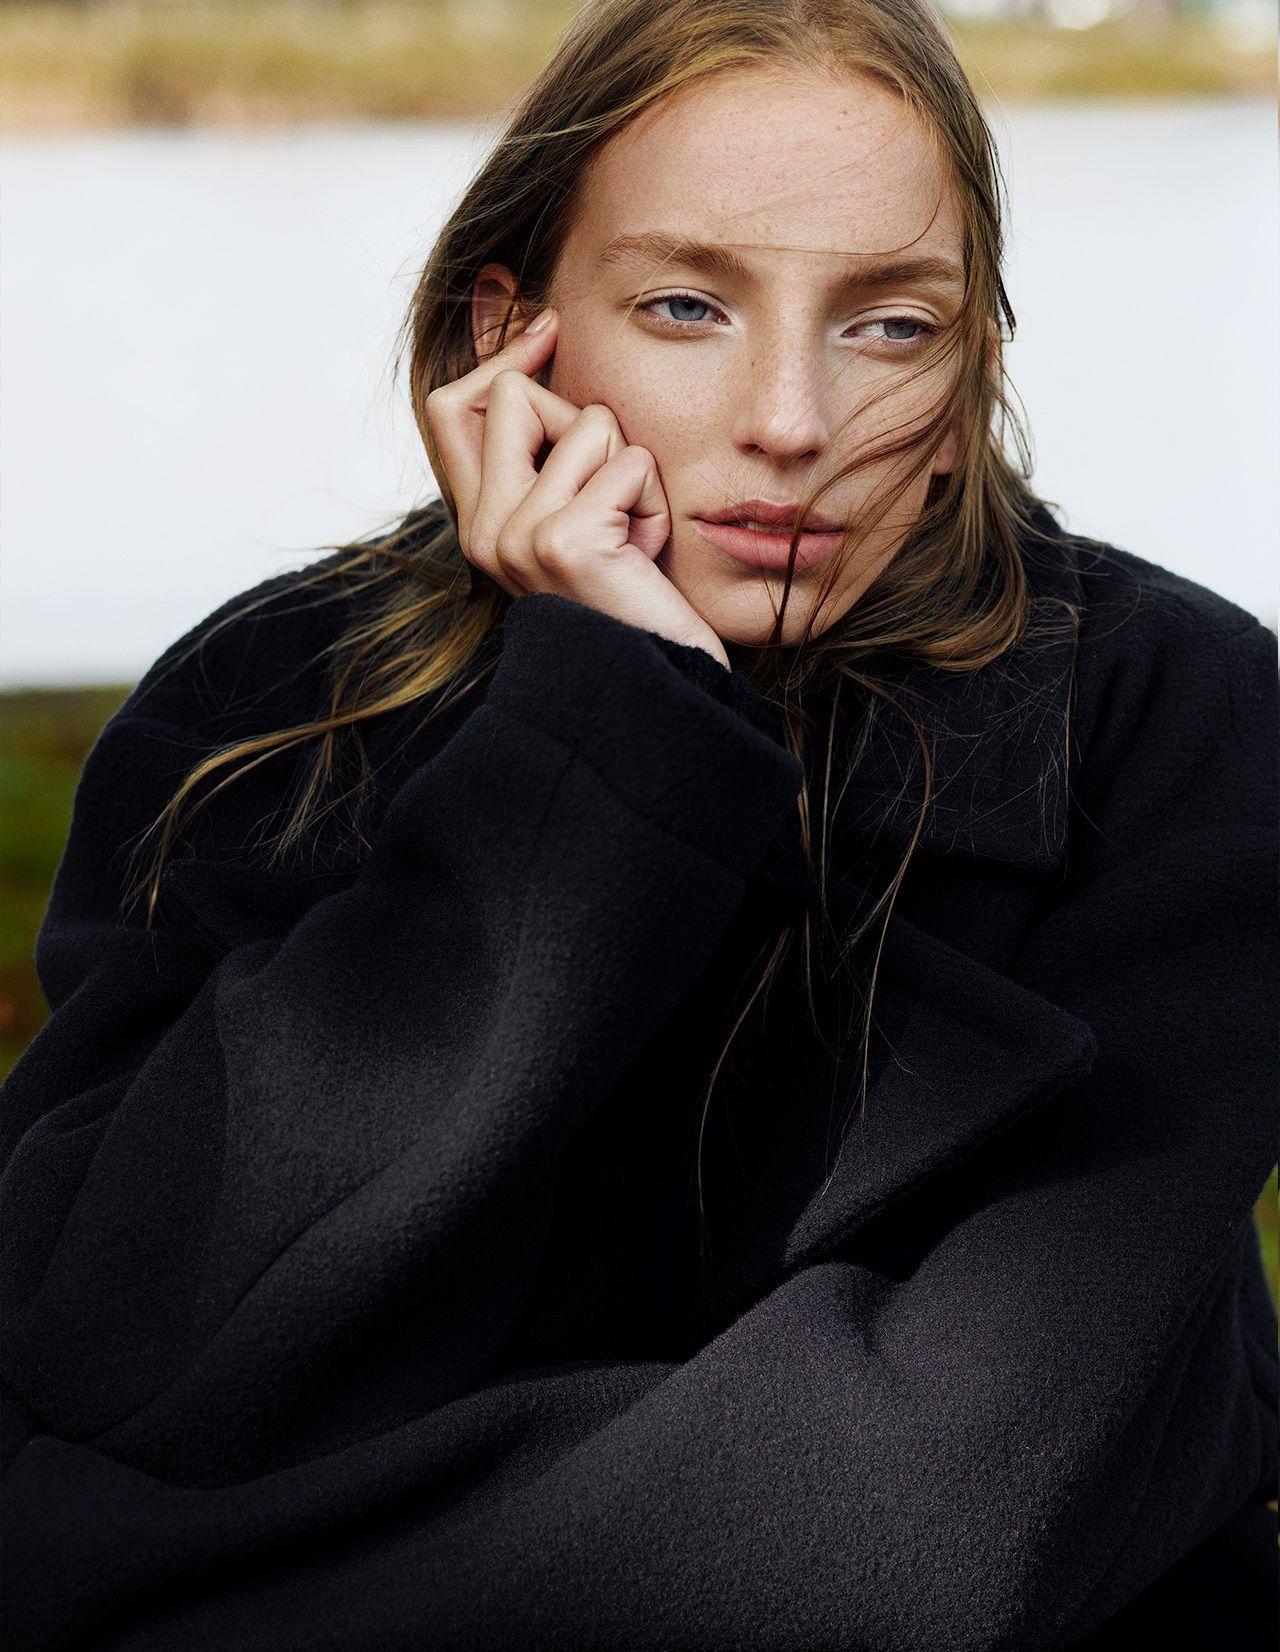 Publication: Models.com Model: Jamilla Hoogenboom Photographer: Migjen Rama Fashion Editor: Hannah van Well Makeup: Siddhartha Bekers